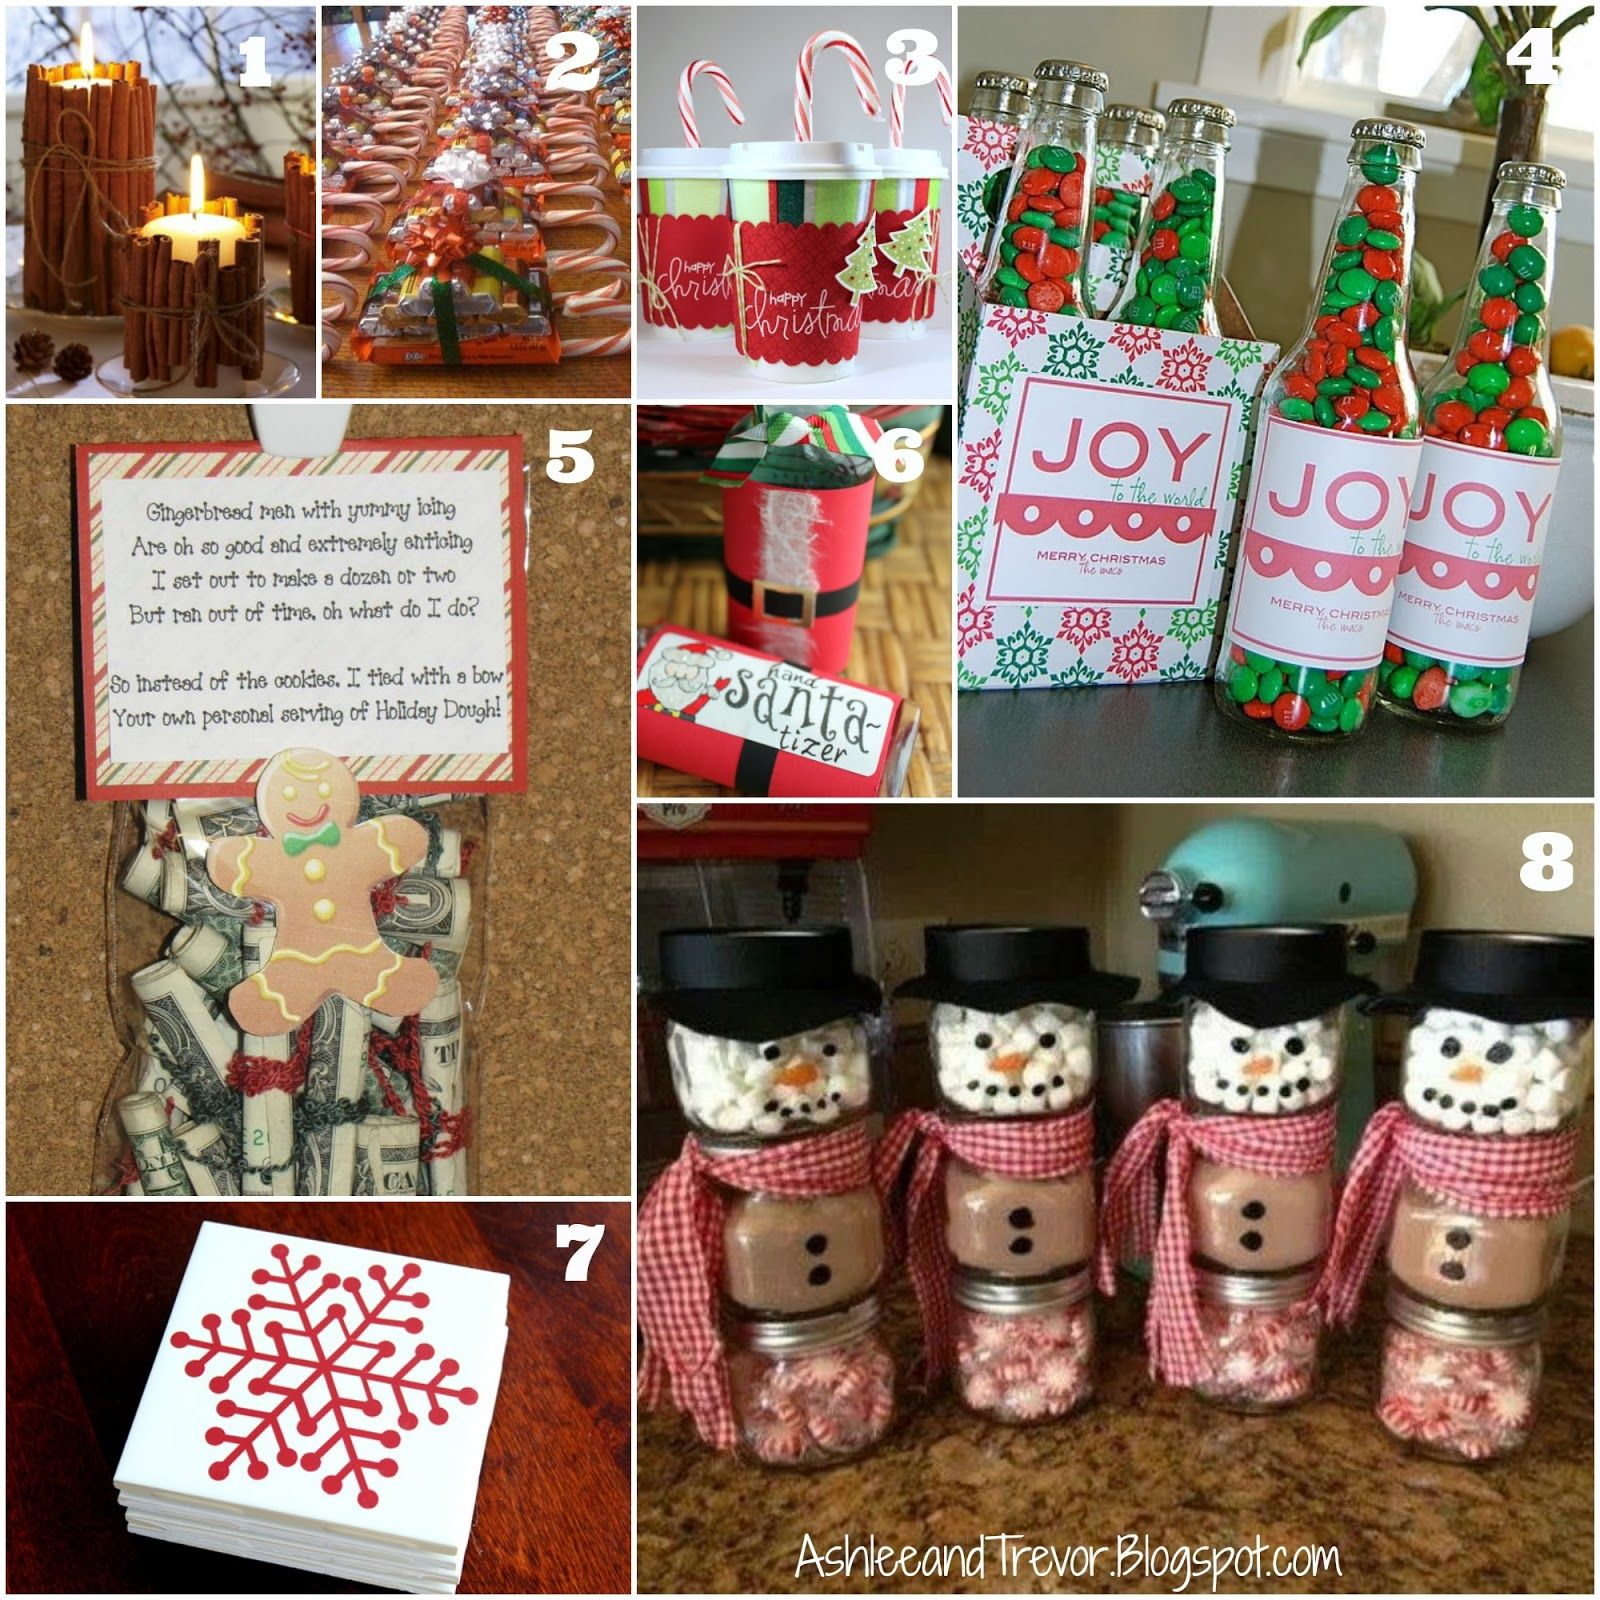 Smith Family Diy Inexpensive Christmas Gifts Inexpensive Holiday Gifts Inexpensive Christmas Gifts Inexpensive Christmas